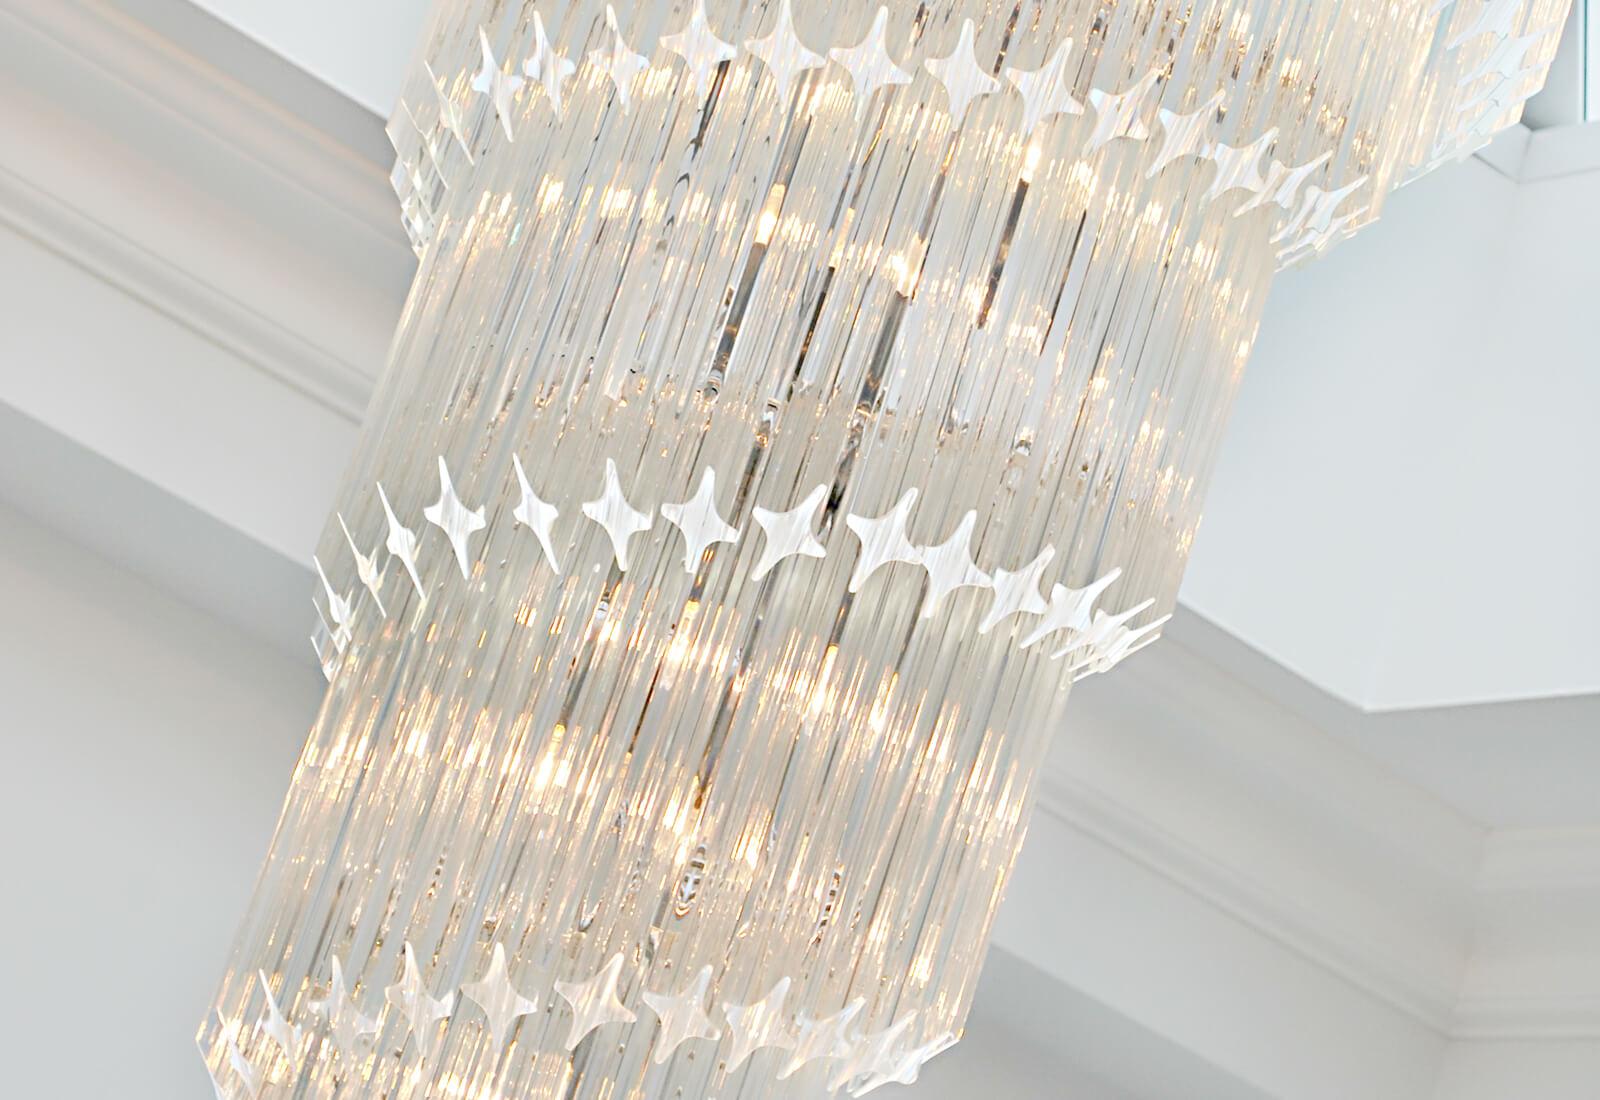 New york villaverde london villaverde london new york crystal chandelier 02 villaverdenewyorkchandelier01 aloadofball Images